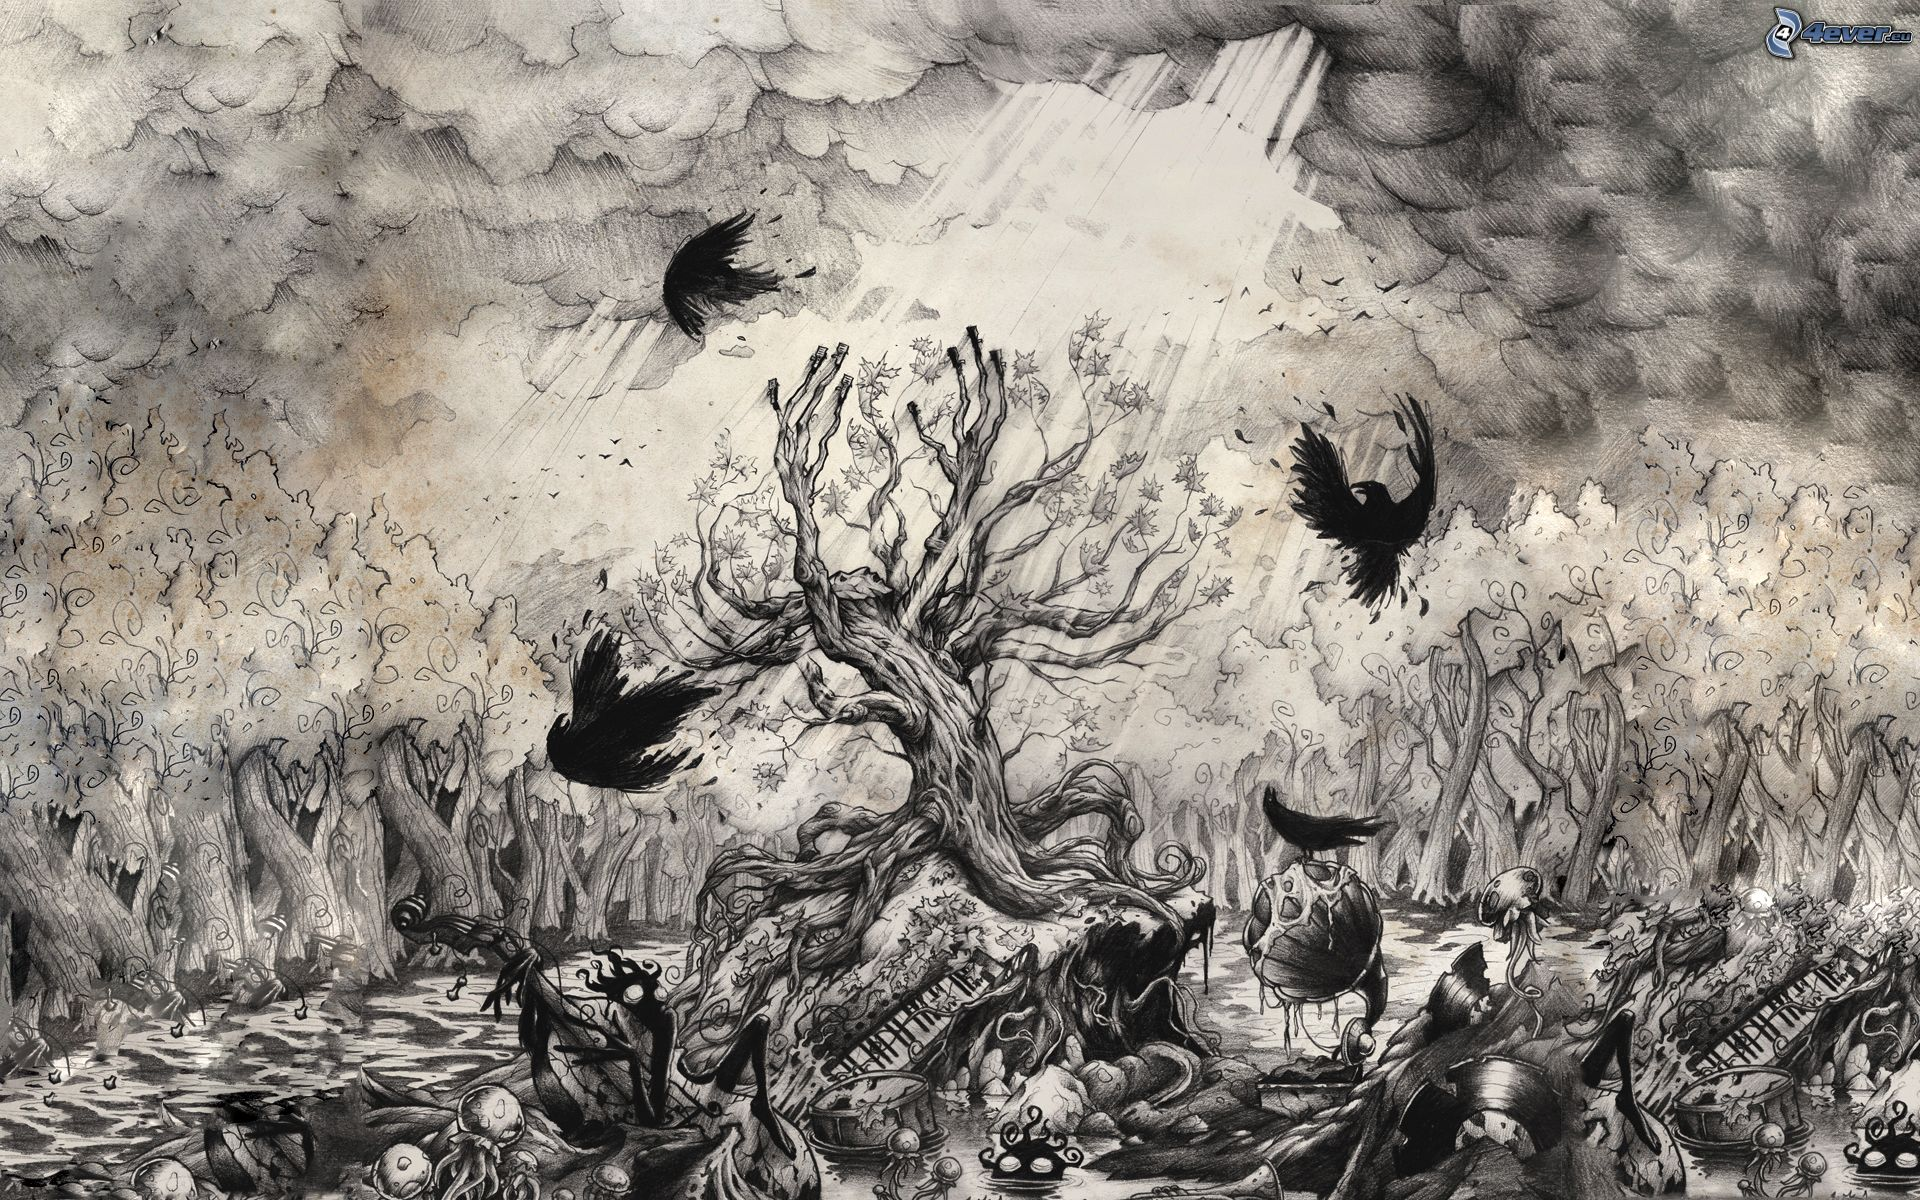 Drawn raven tree Jpg tree forest 172485 crows